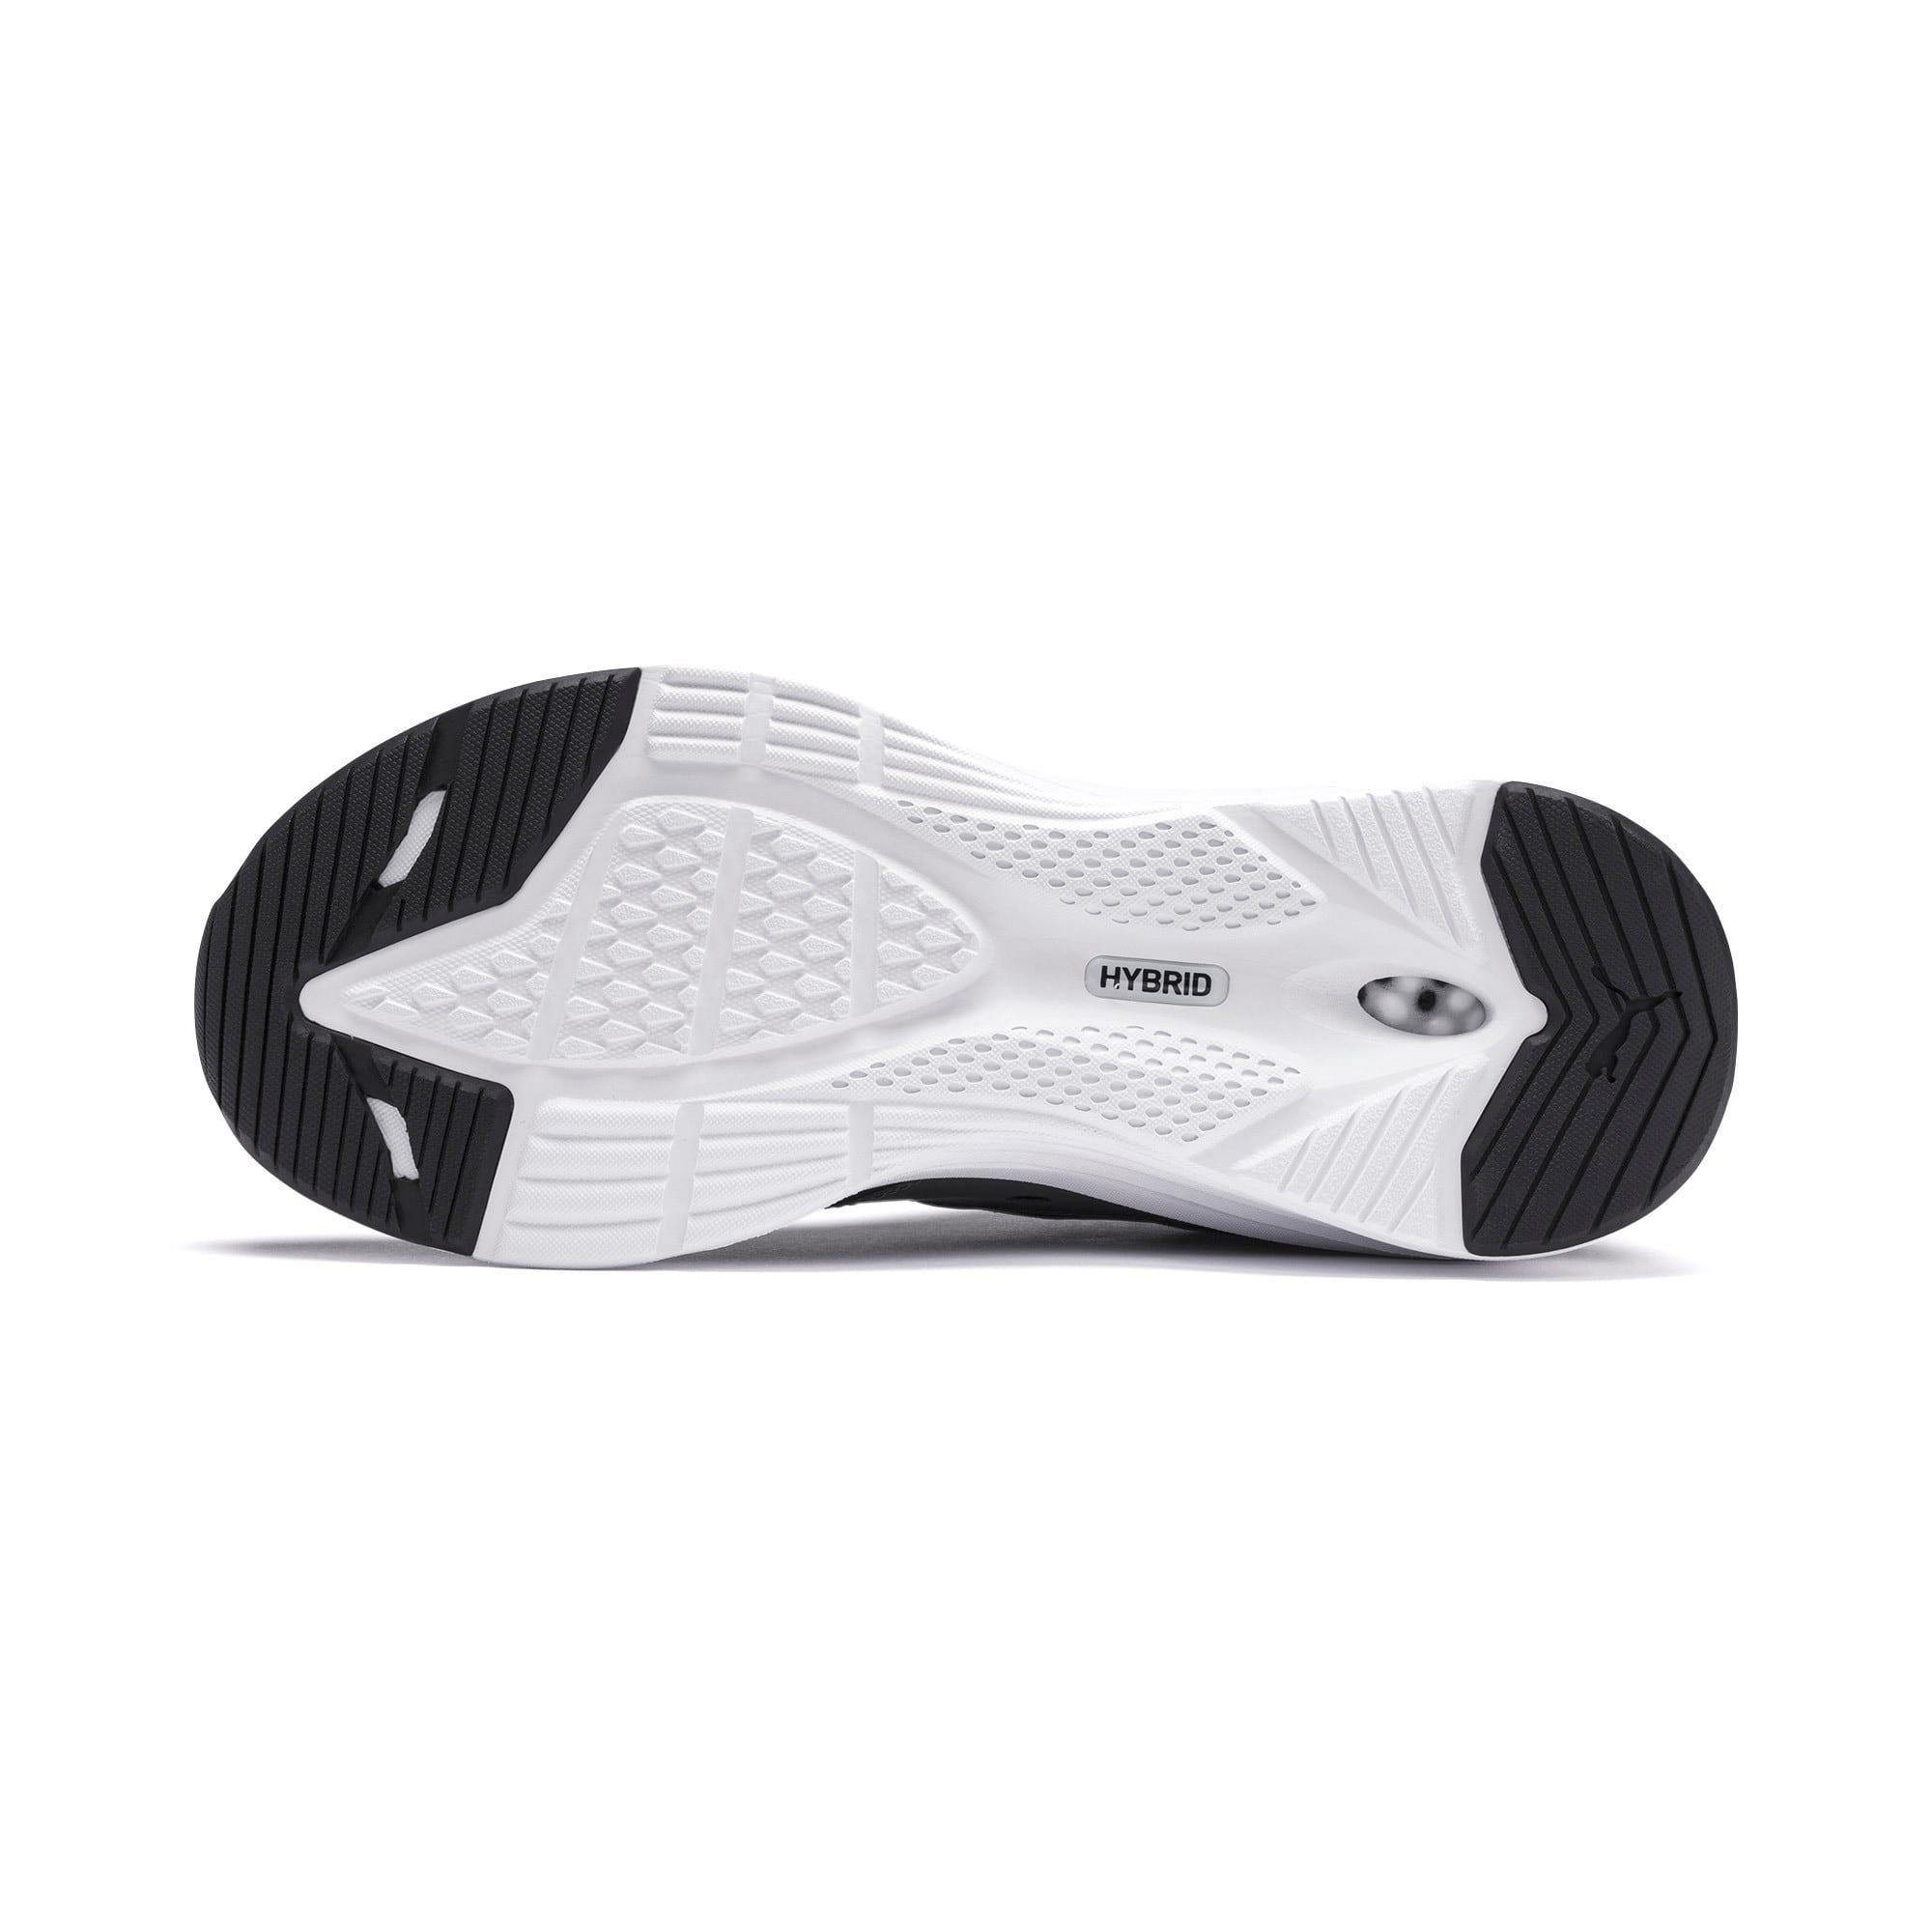 Thumbnail 4 of Damskie buty do biegania HYBRID Fuego, Puma Black-Puma White, medium